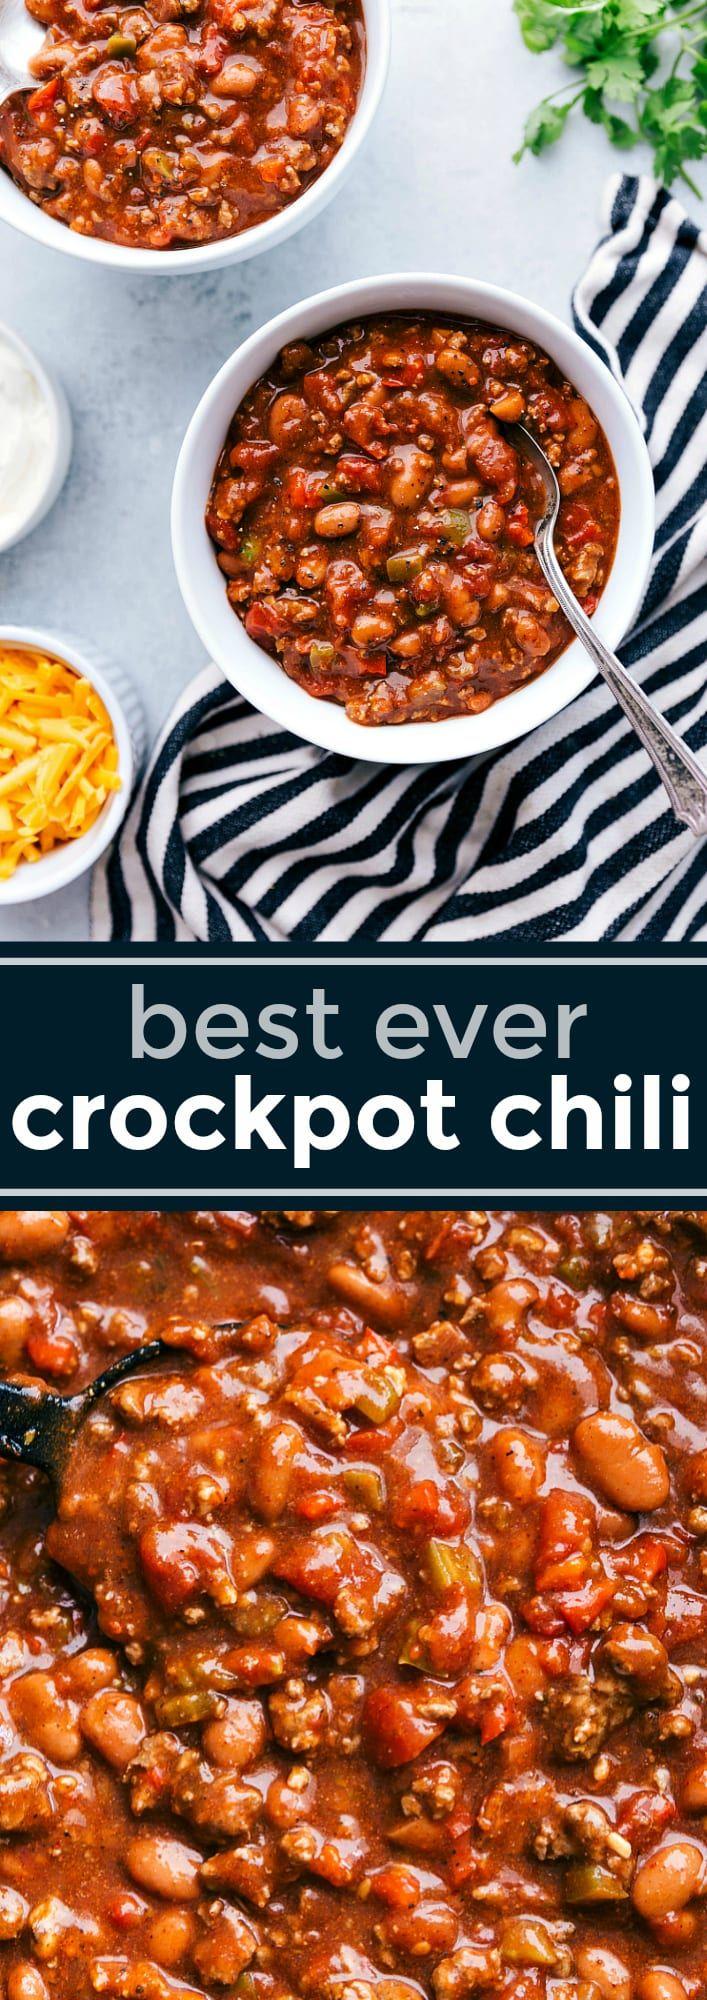 Crockpot Chili {Cookoff Winner!} | Chelsea's Messy Apron #chilirecipe